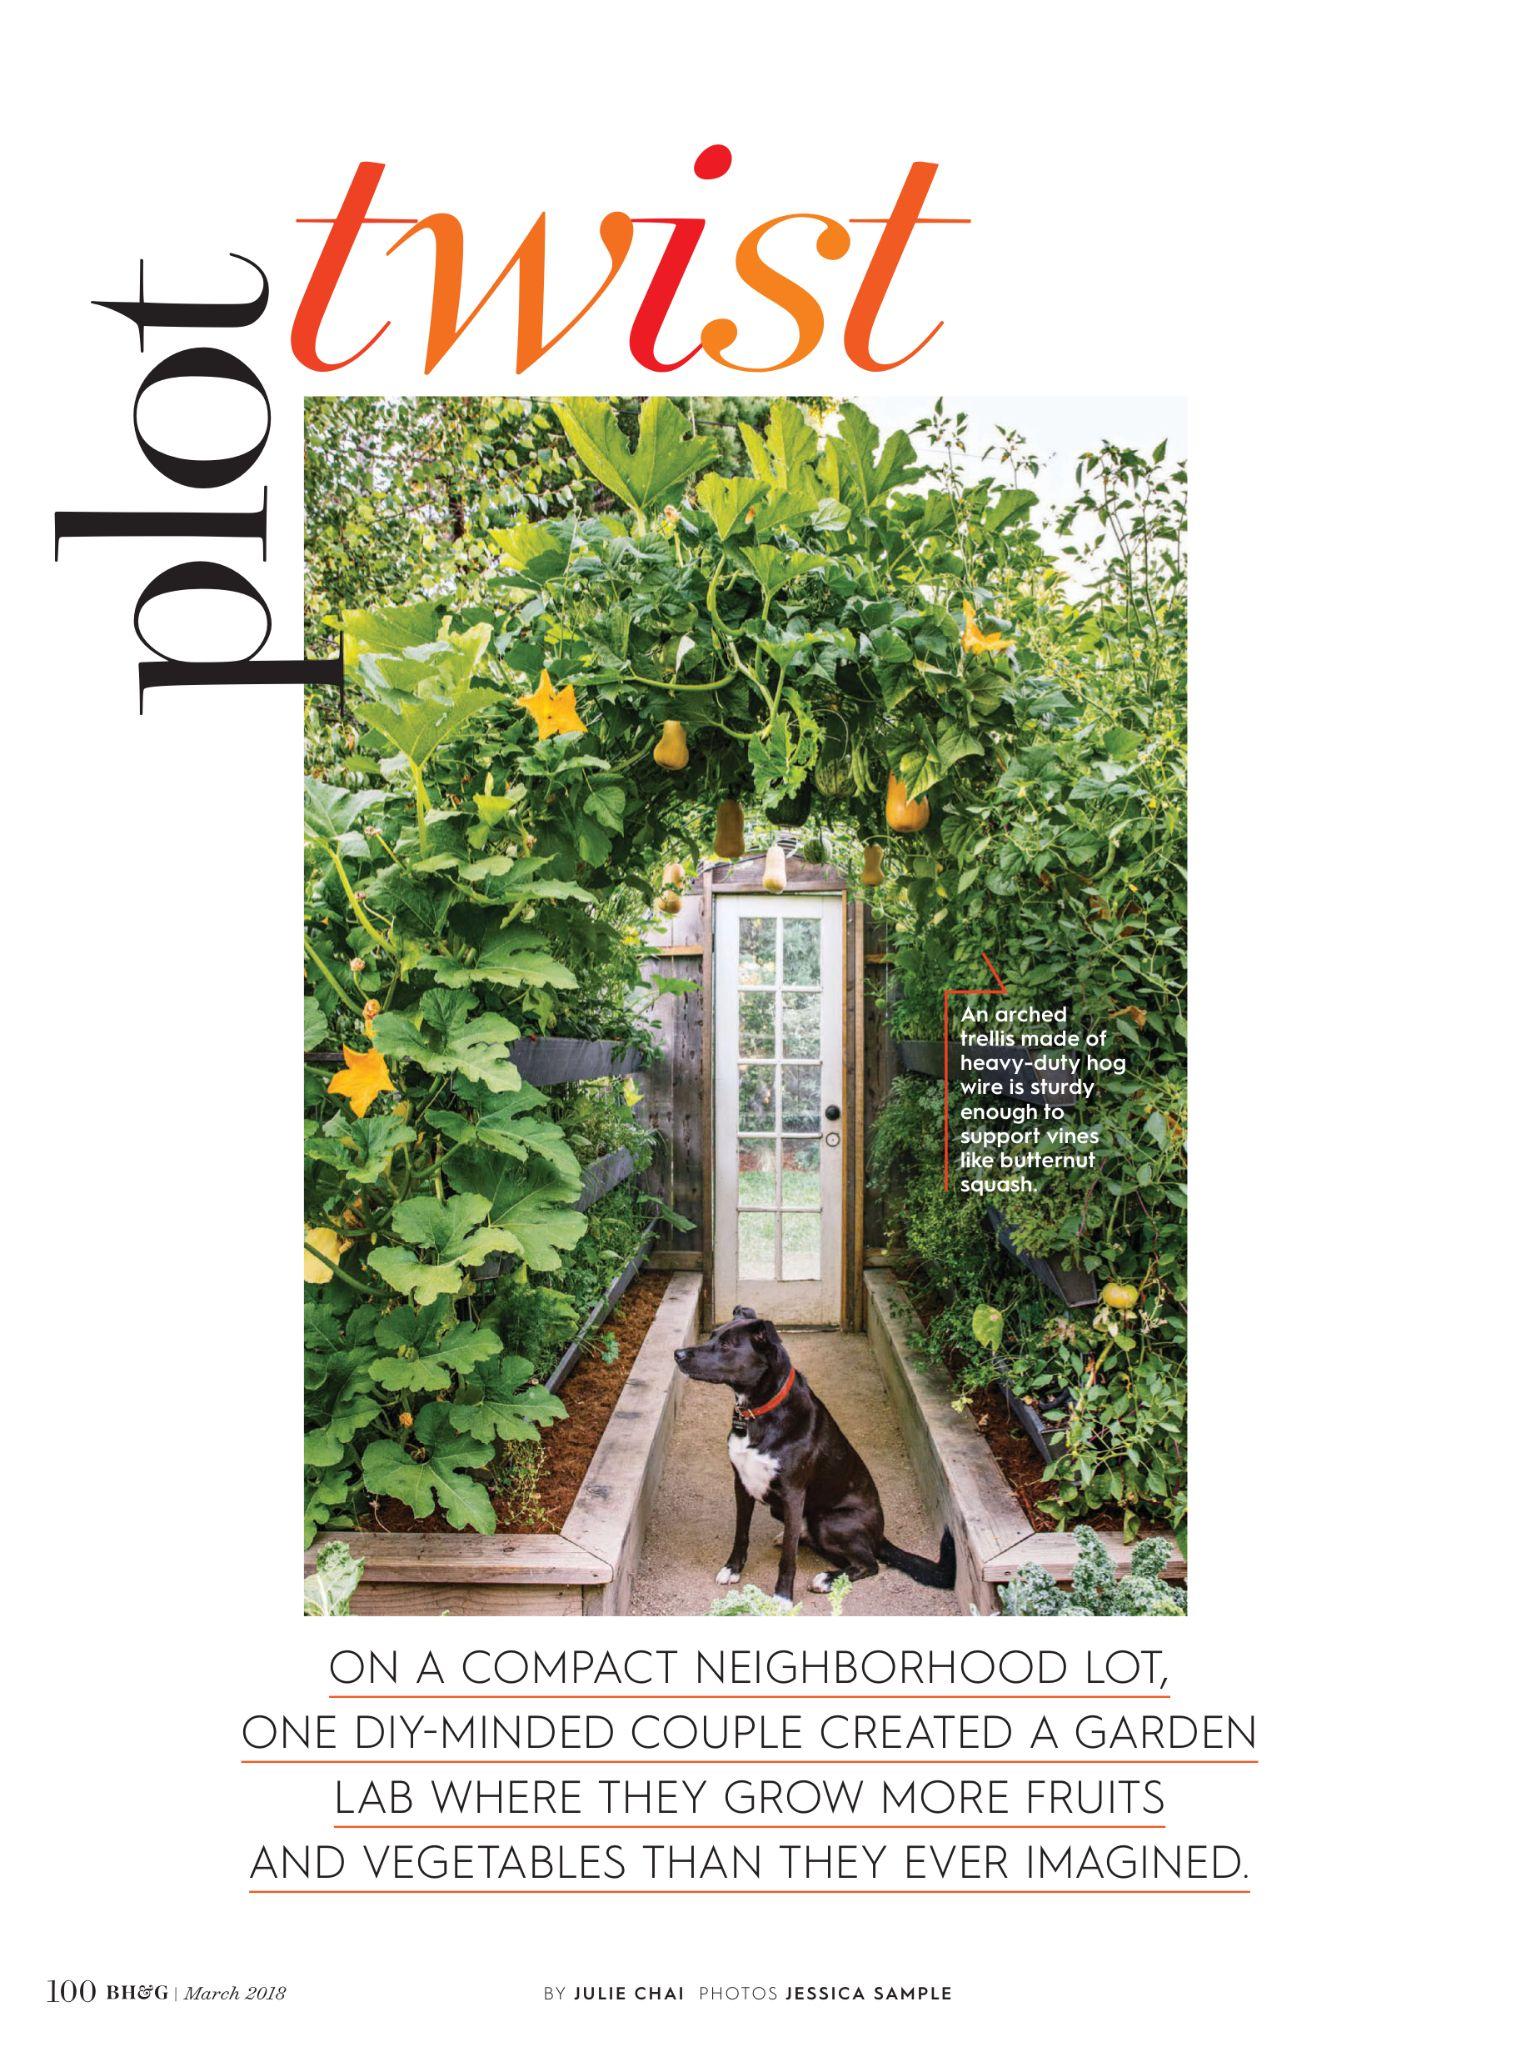 69cf110aa3eb93c44acf0bae32d7556b - Better Homes And Gardens Cookbook 2018